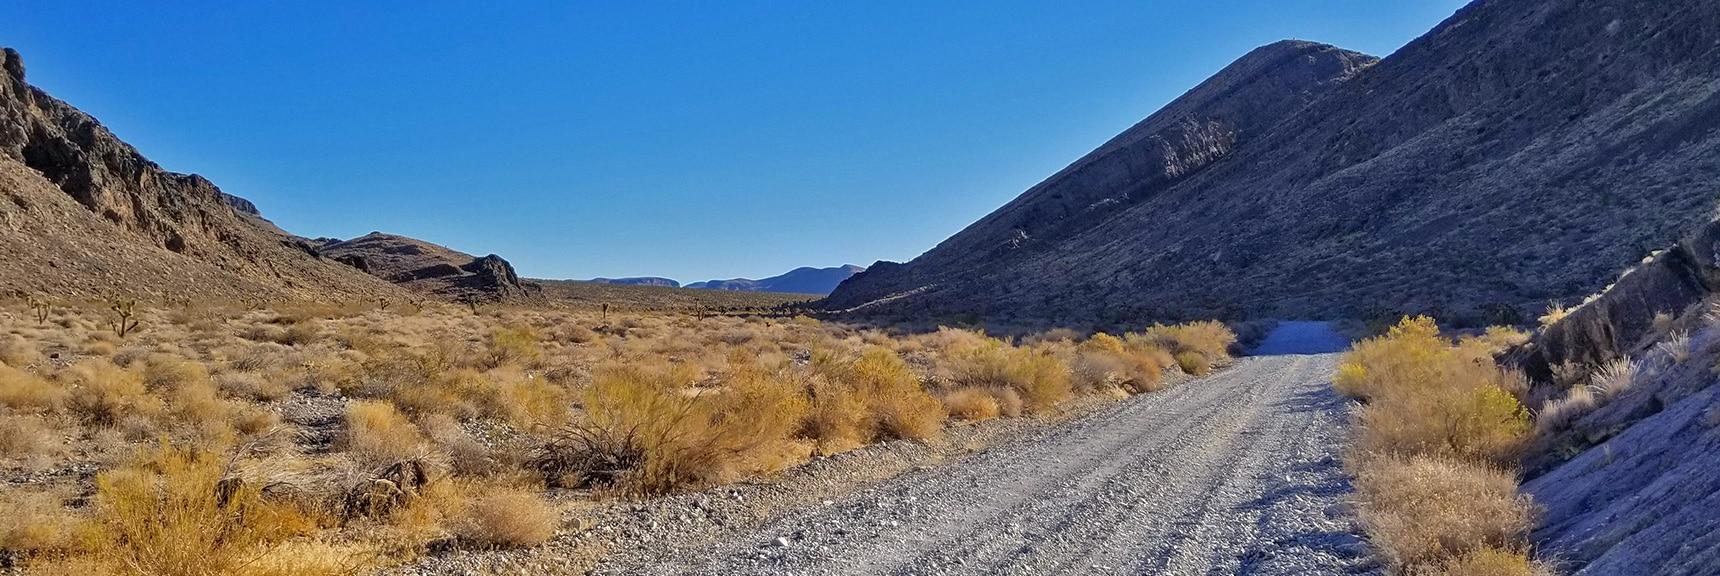 View Through Yucca Gap: Sheep Range to Left, Fossil Ridge to Right   Lower Mormon Well Road   Sheep Range, Desert National Wildlife Refuge, Nevada